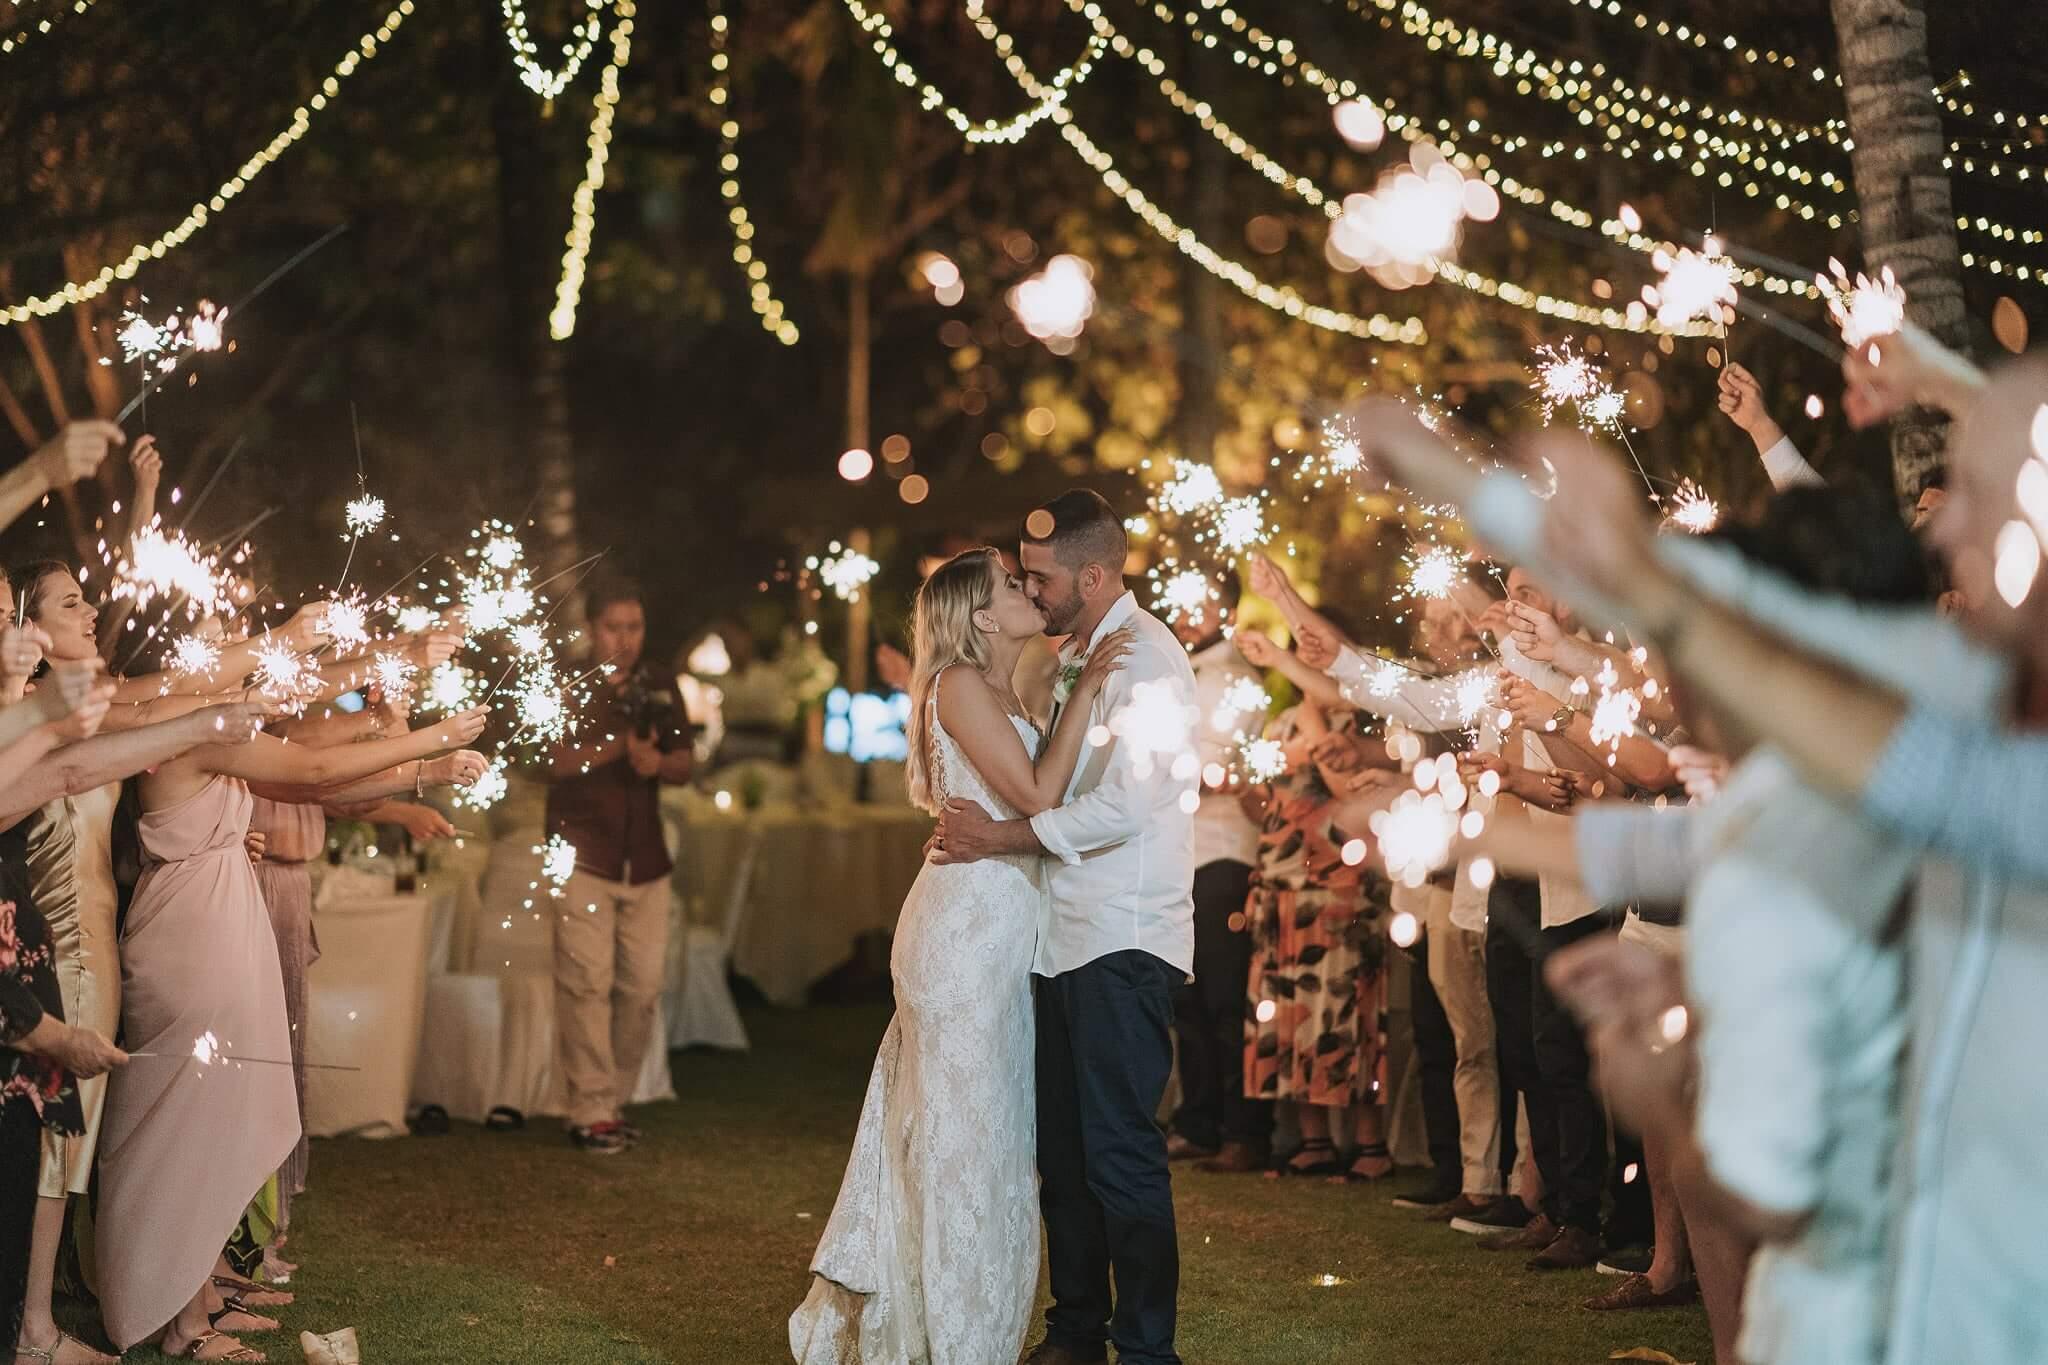 rambo-estrada-jamiejayson-ayodya-resort-nusa-dua-bali-wedding-photographer-2491-min (1).JPG